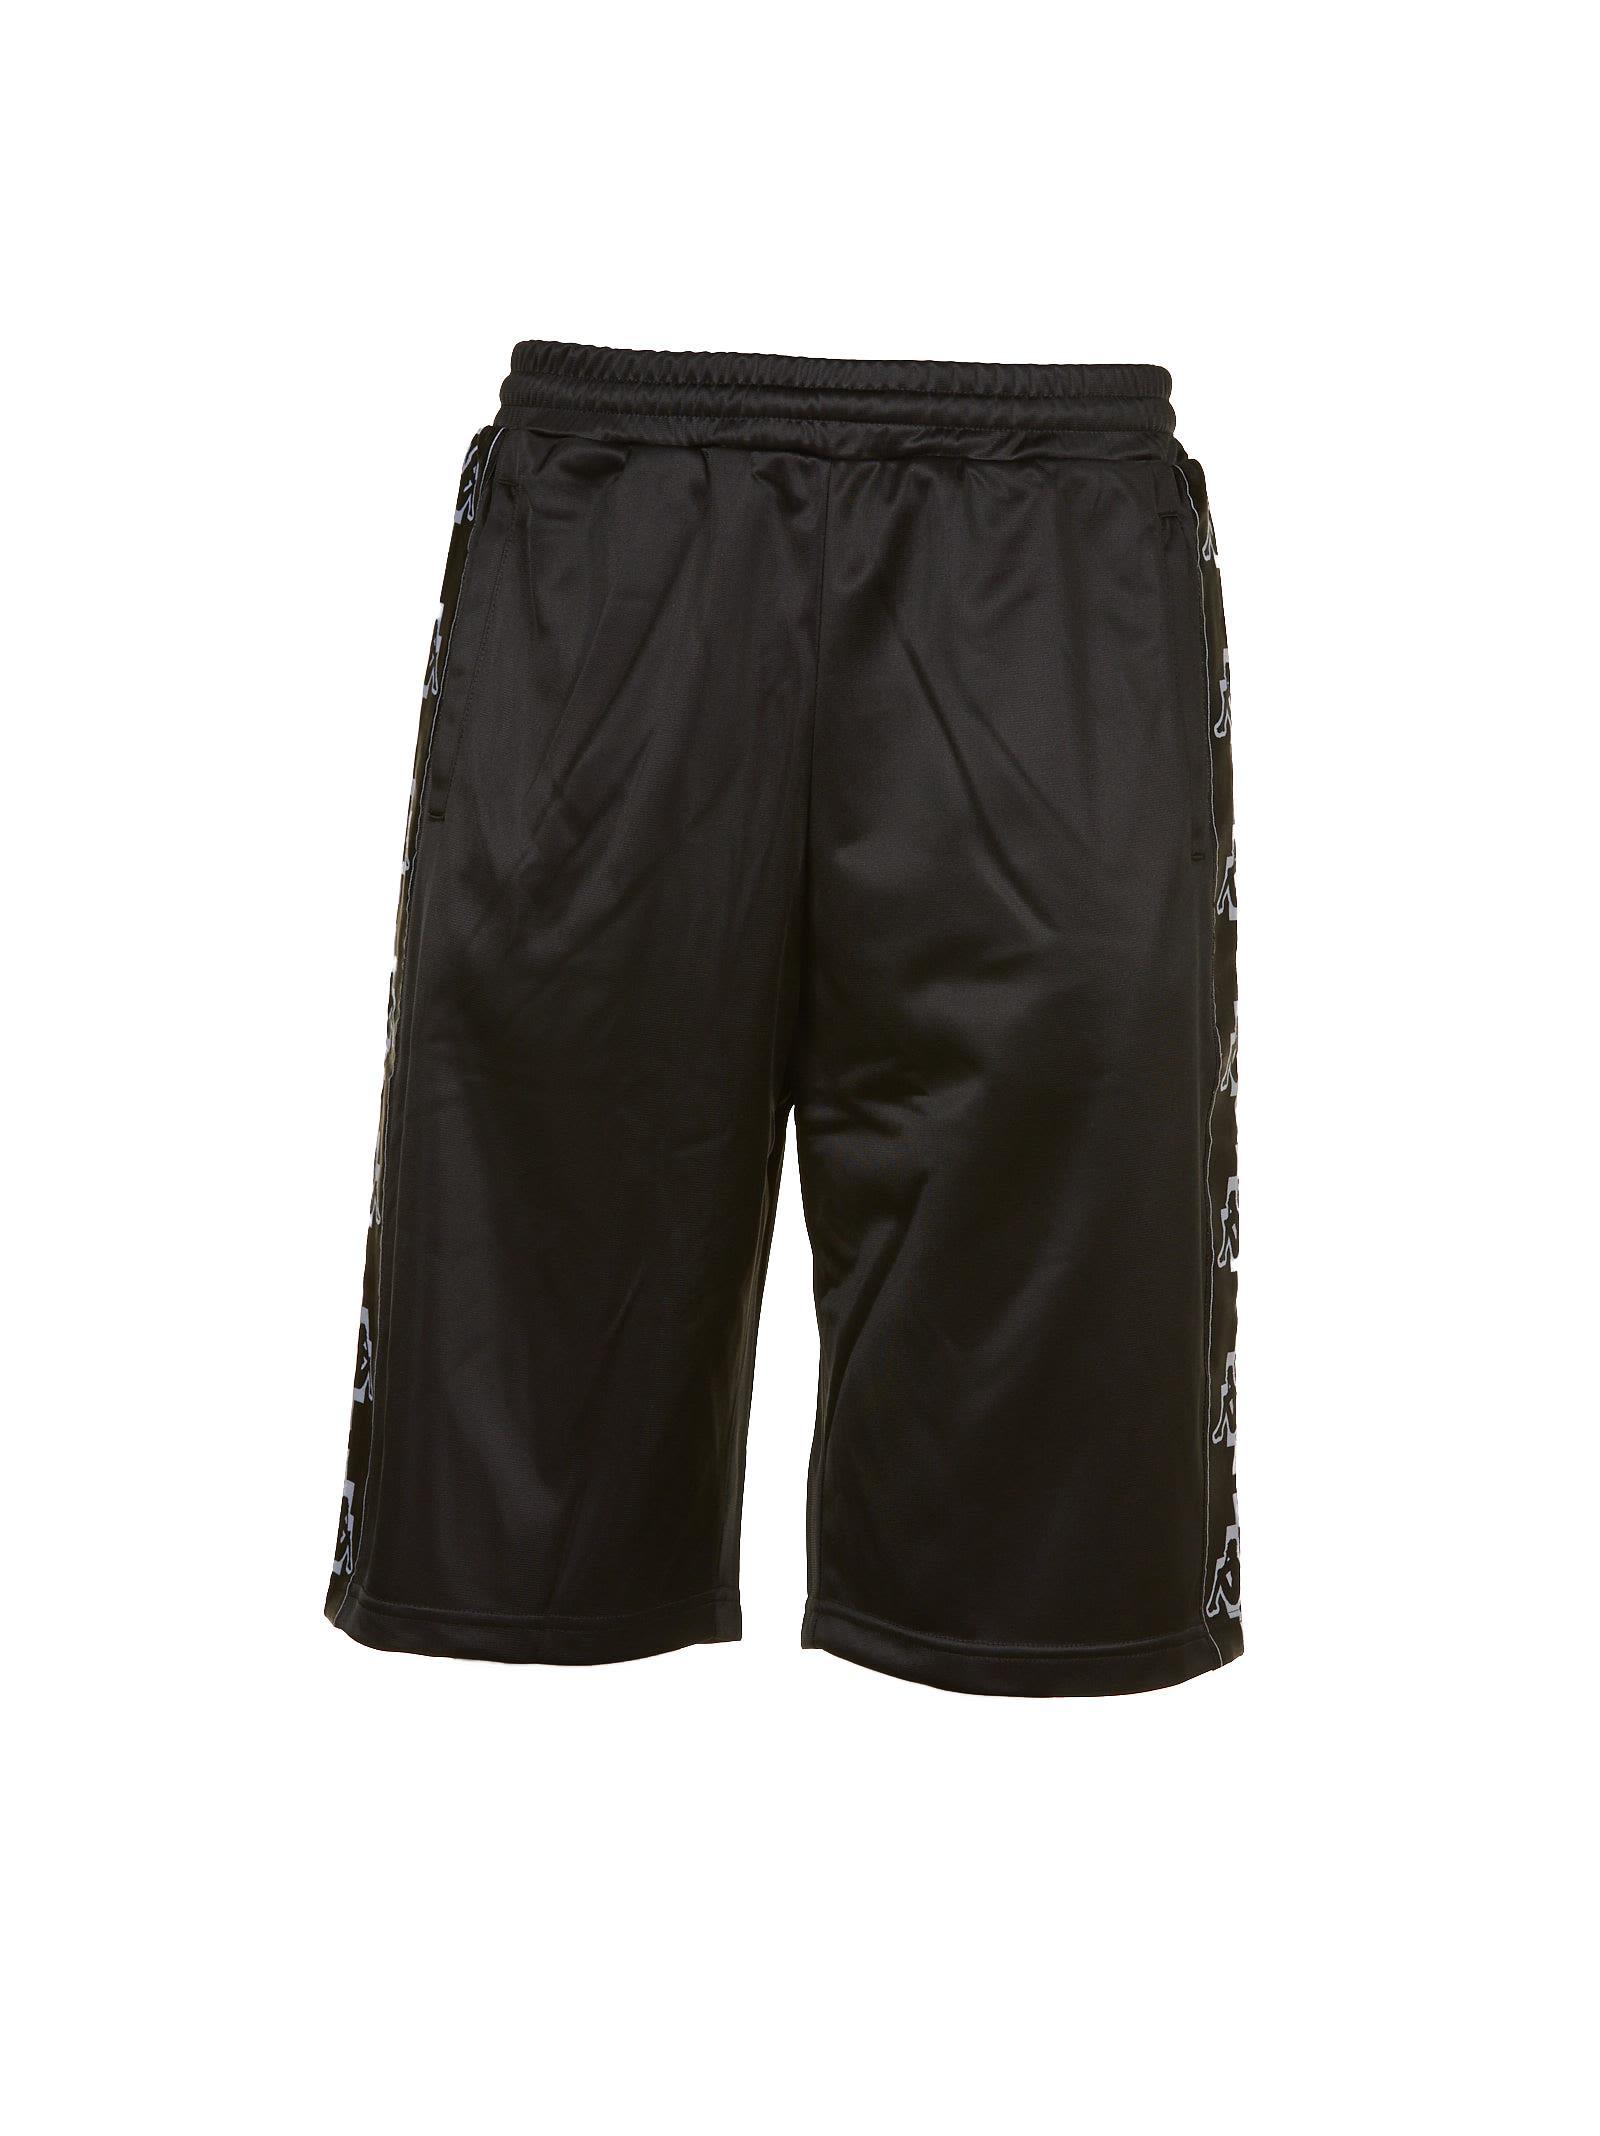 Marcelo Burlon Kappa Tape Shorts